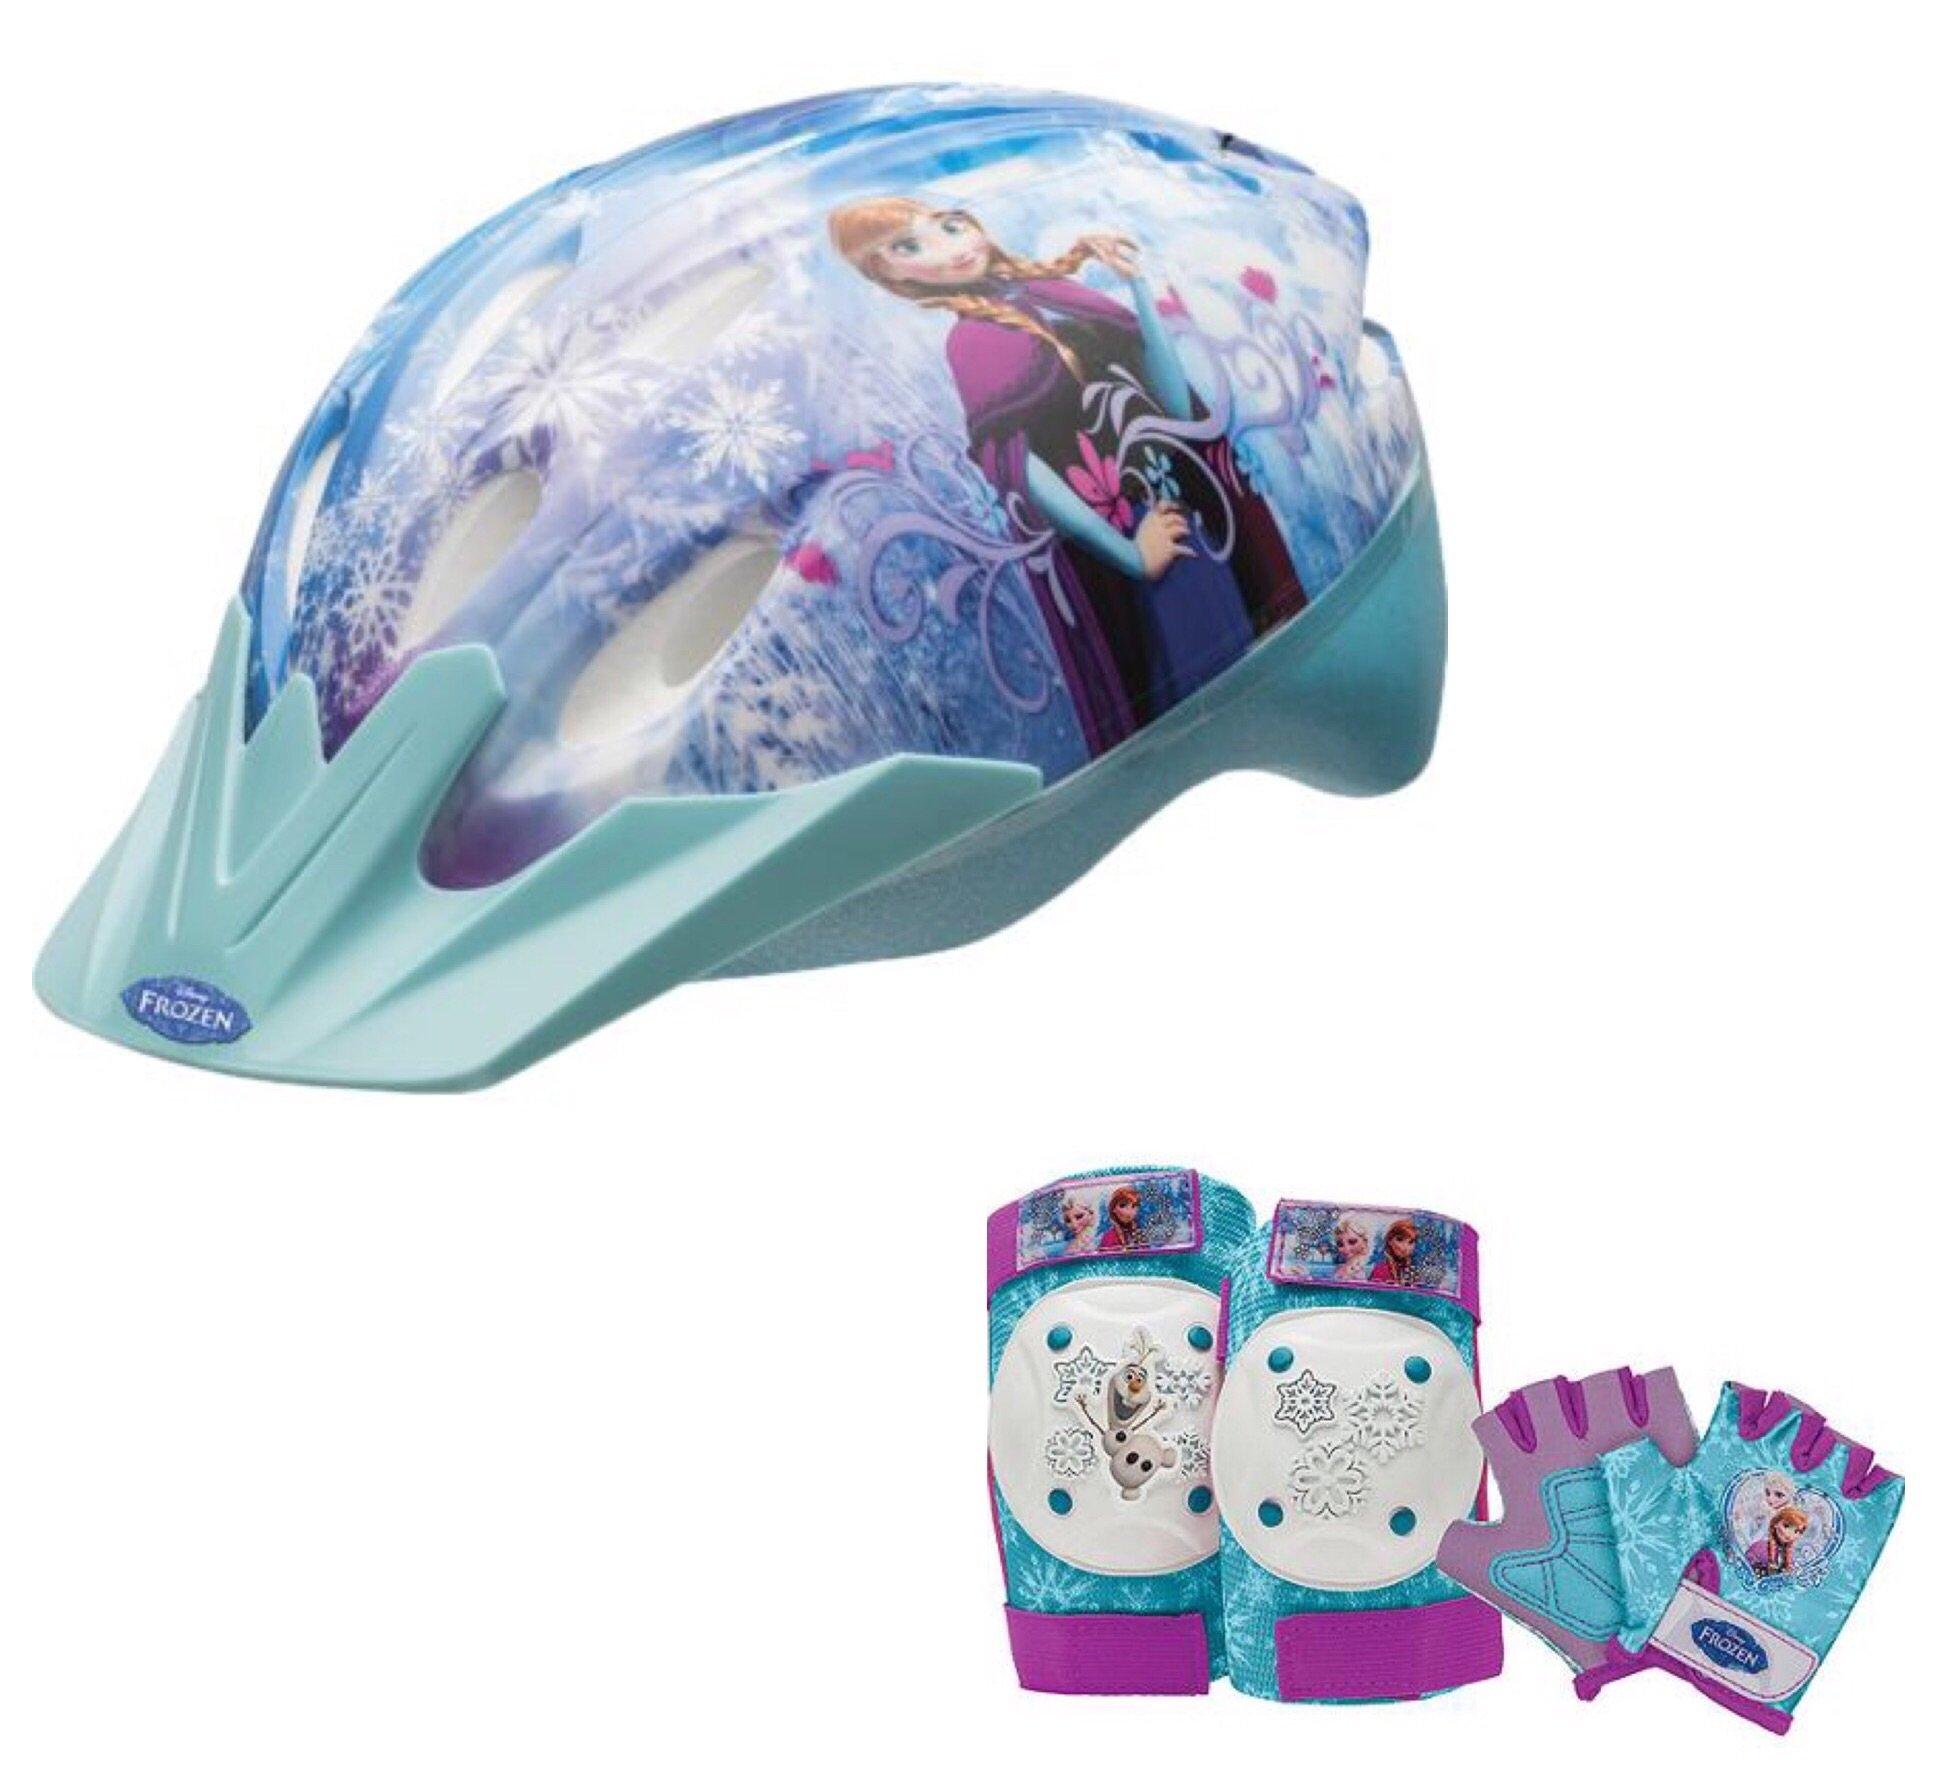 Disney Frozen Girls Skate / Bike Helmet, Pads & Gloves - 7 Piece Set